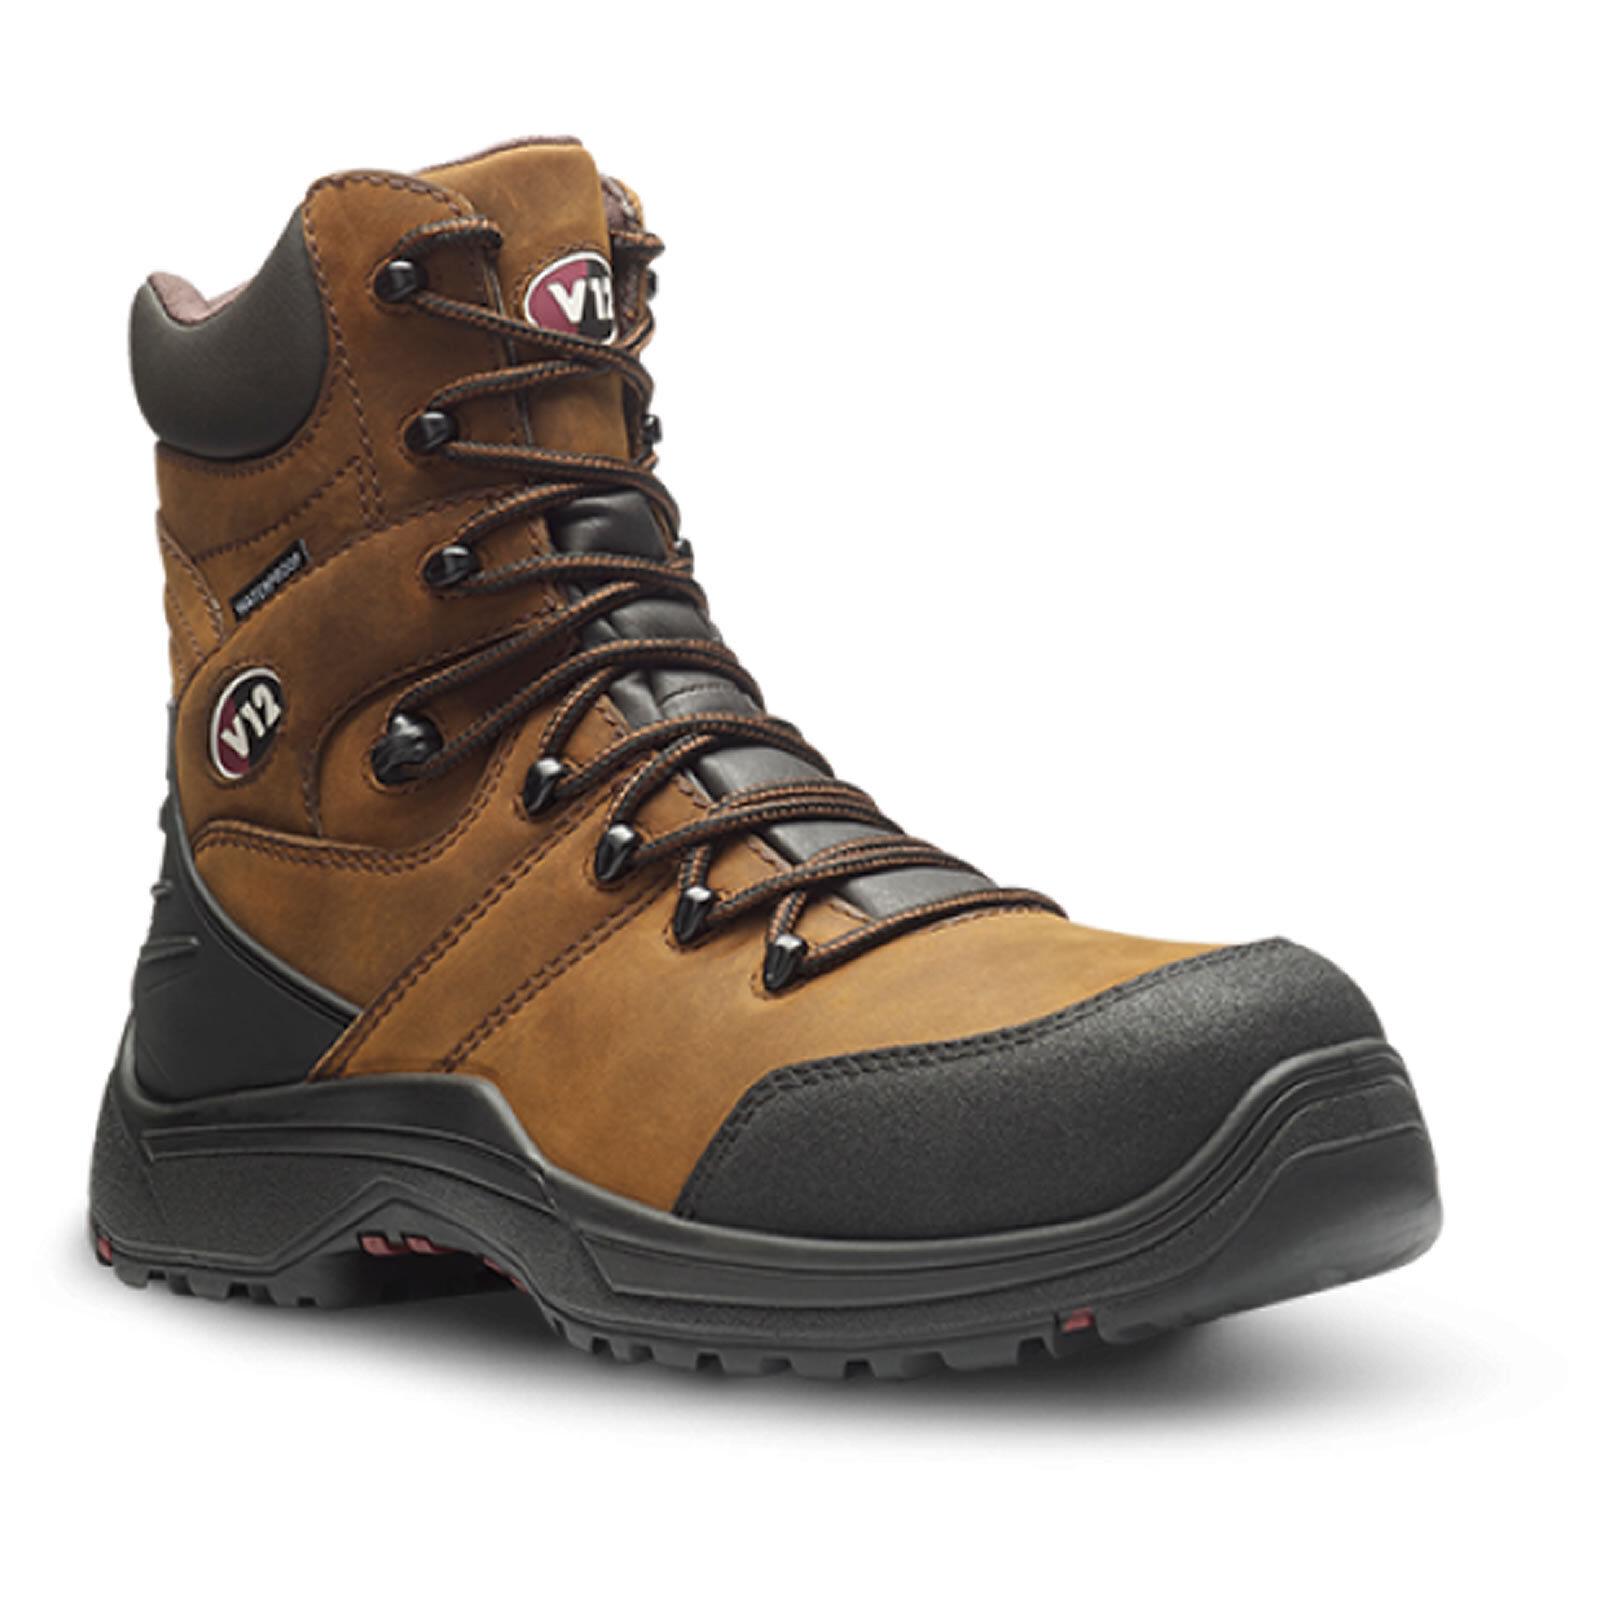 V12 V1255.01 Rocky IGS braun Waterproof Leather Work Safety Stiefel Toe Cap S3 SRC